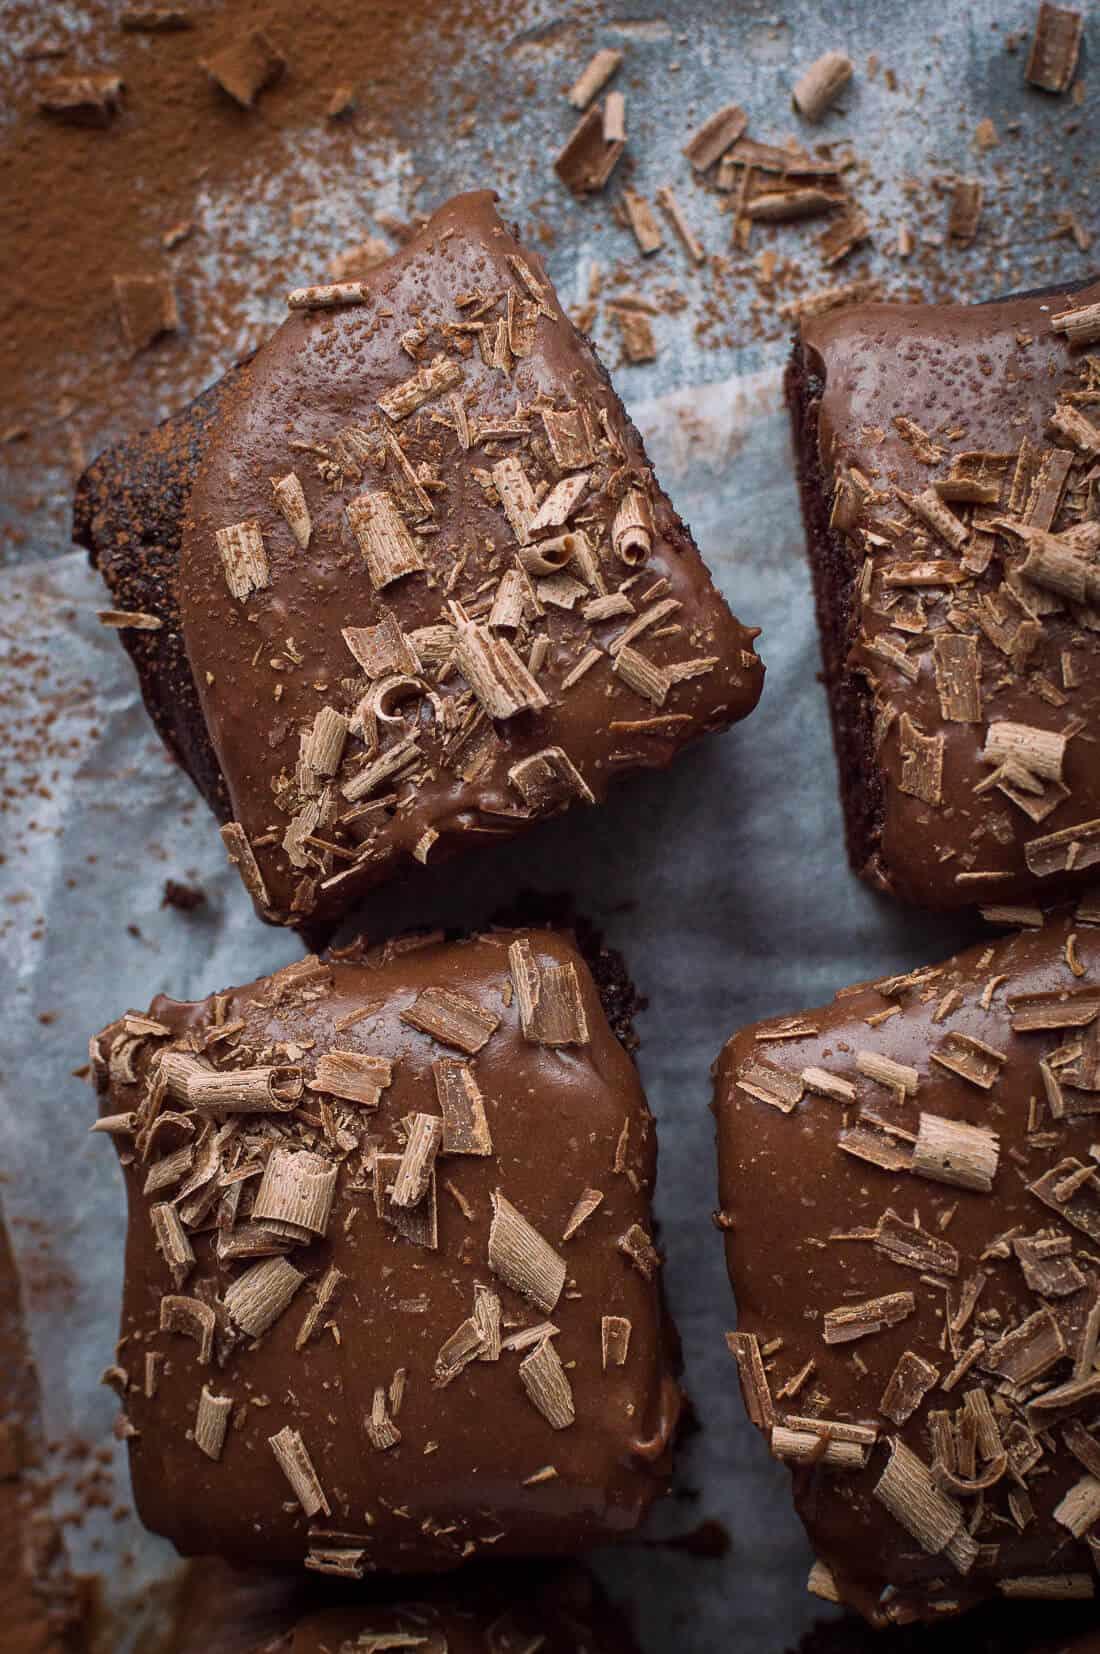 Vegan chocolate traybake cake (sheet cake) with coconut milk ganache.